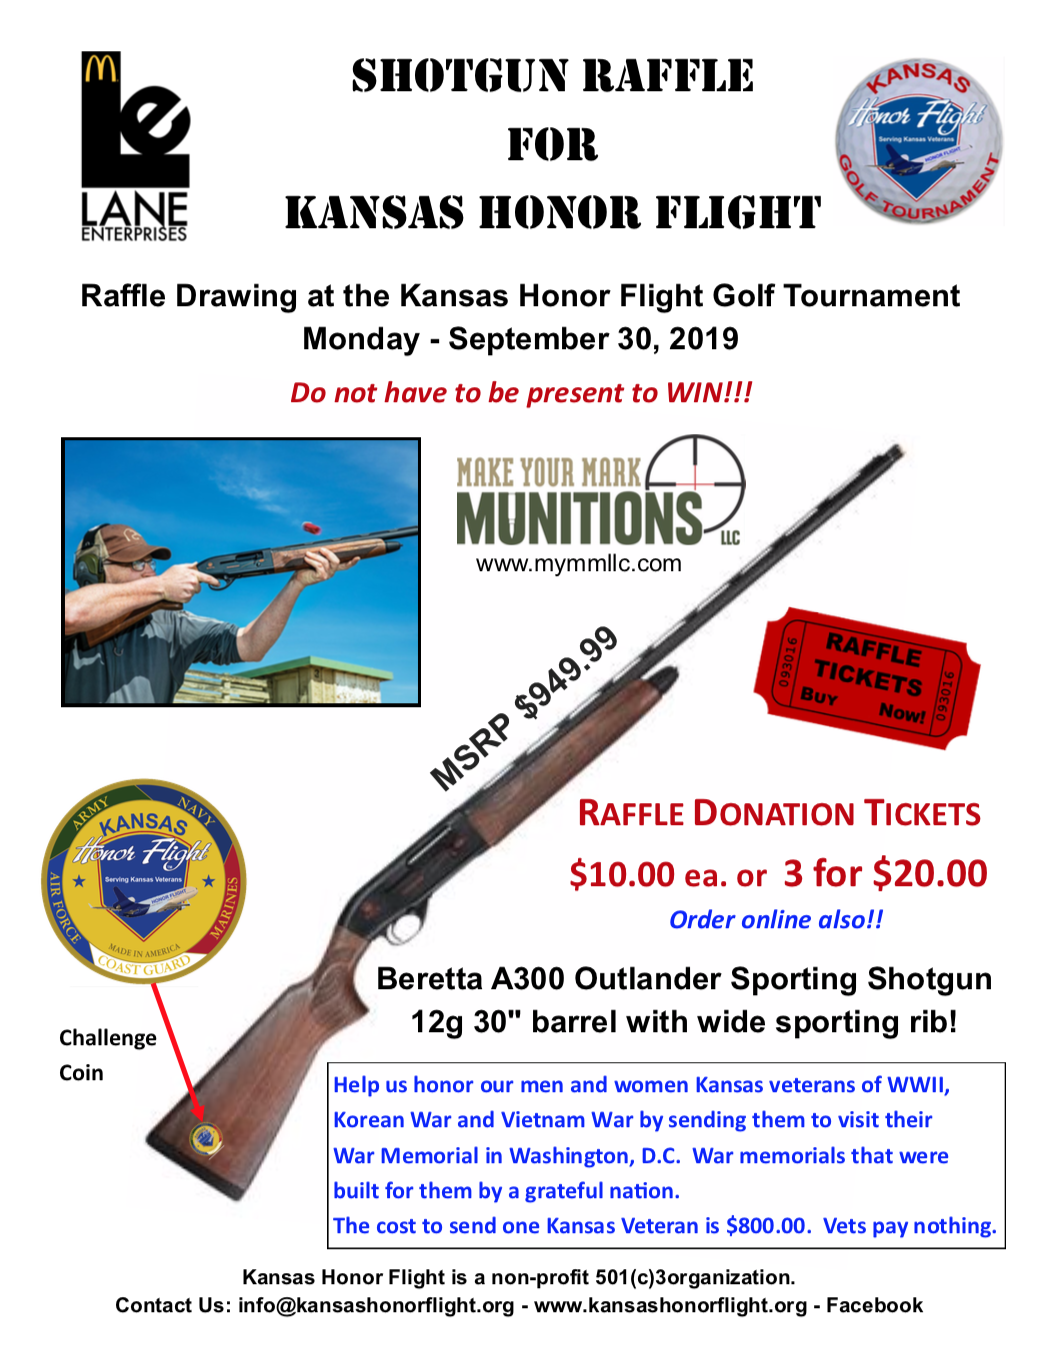 Shotgun Raffle Flyer for Kansas Honor Flight